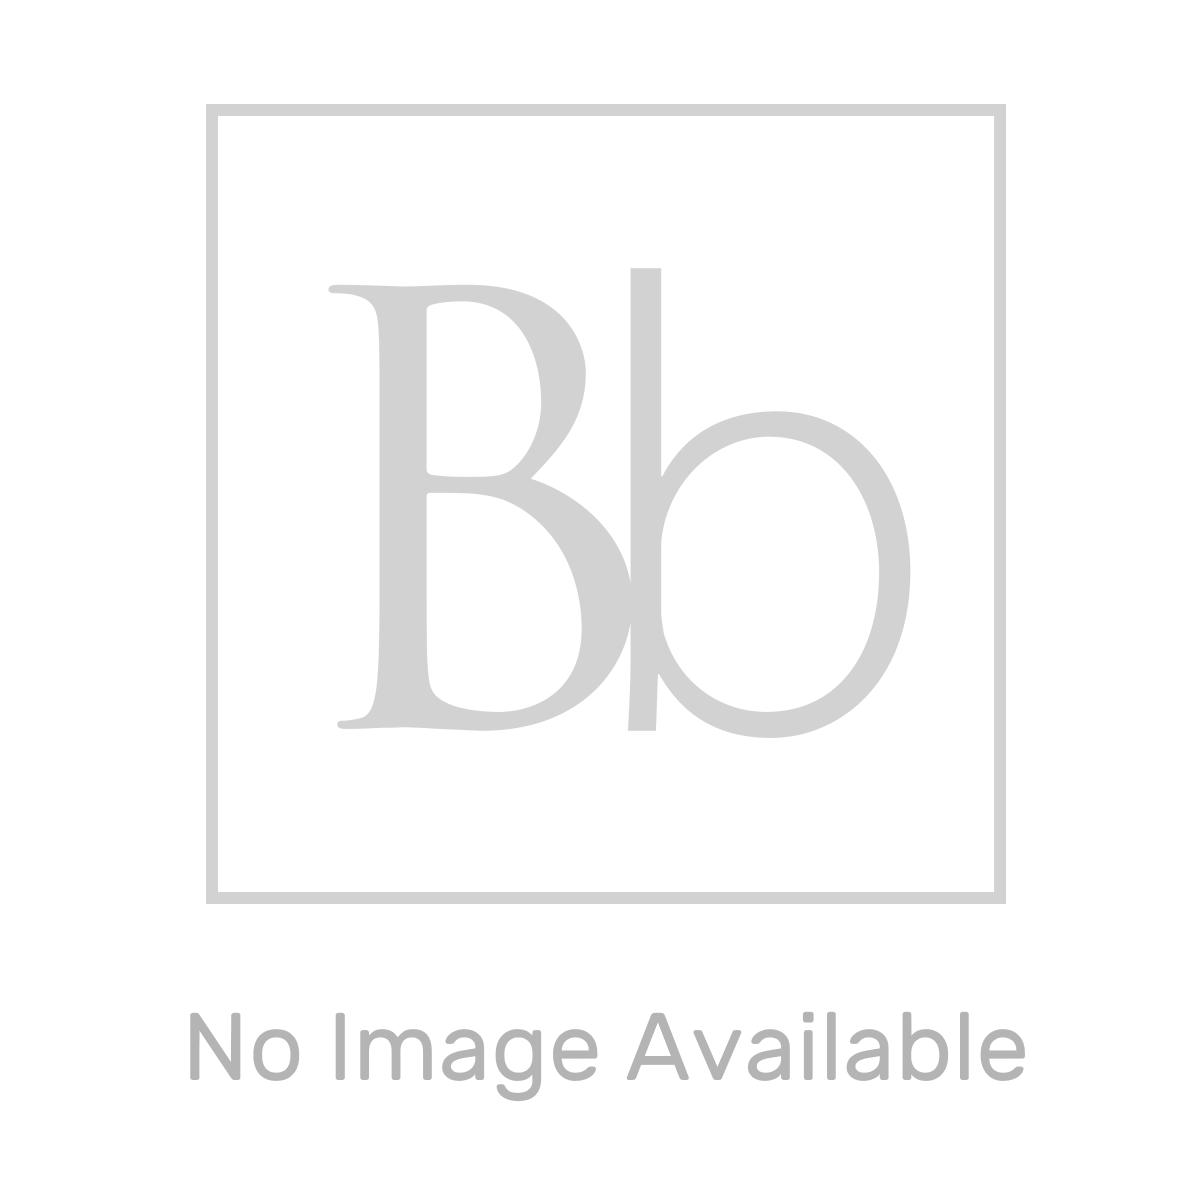 RAK Maremma Orange Matt Tile 600 x 600mm